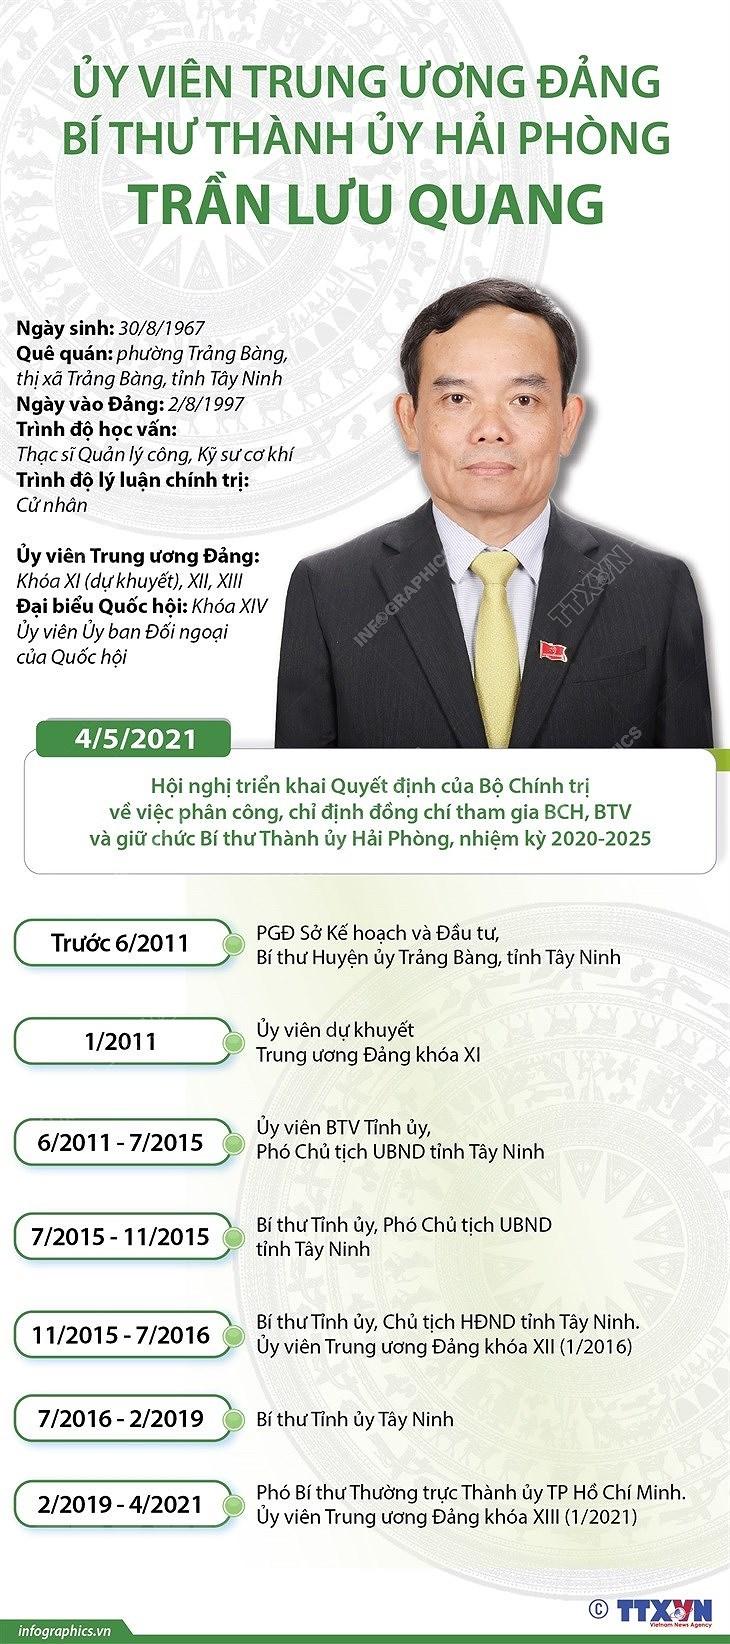 Uy vien Trung uong Dang, Bi thu Thanh uy Hai Phong Tran Luu Quang hinh anh 1